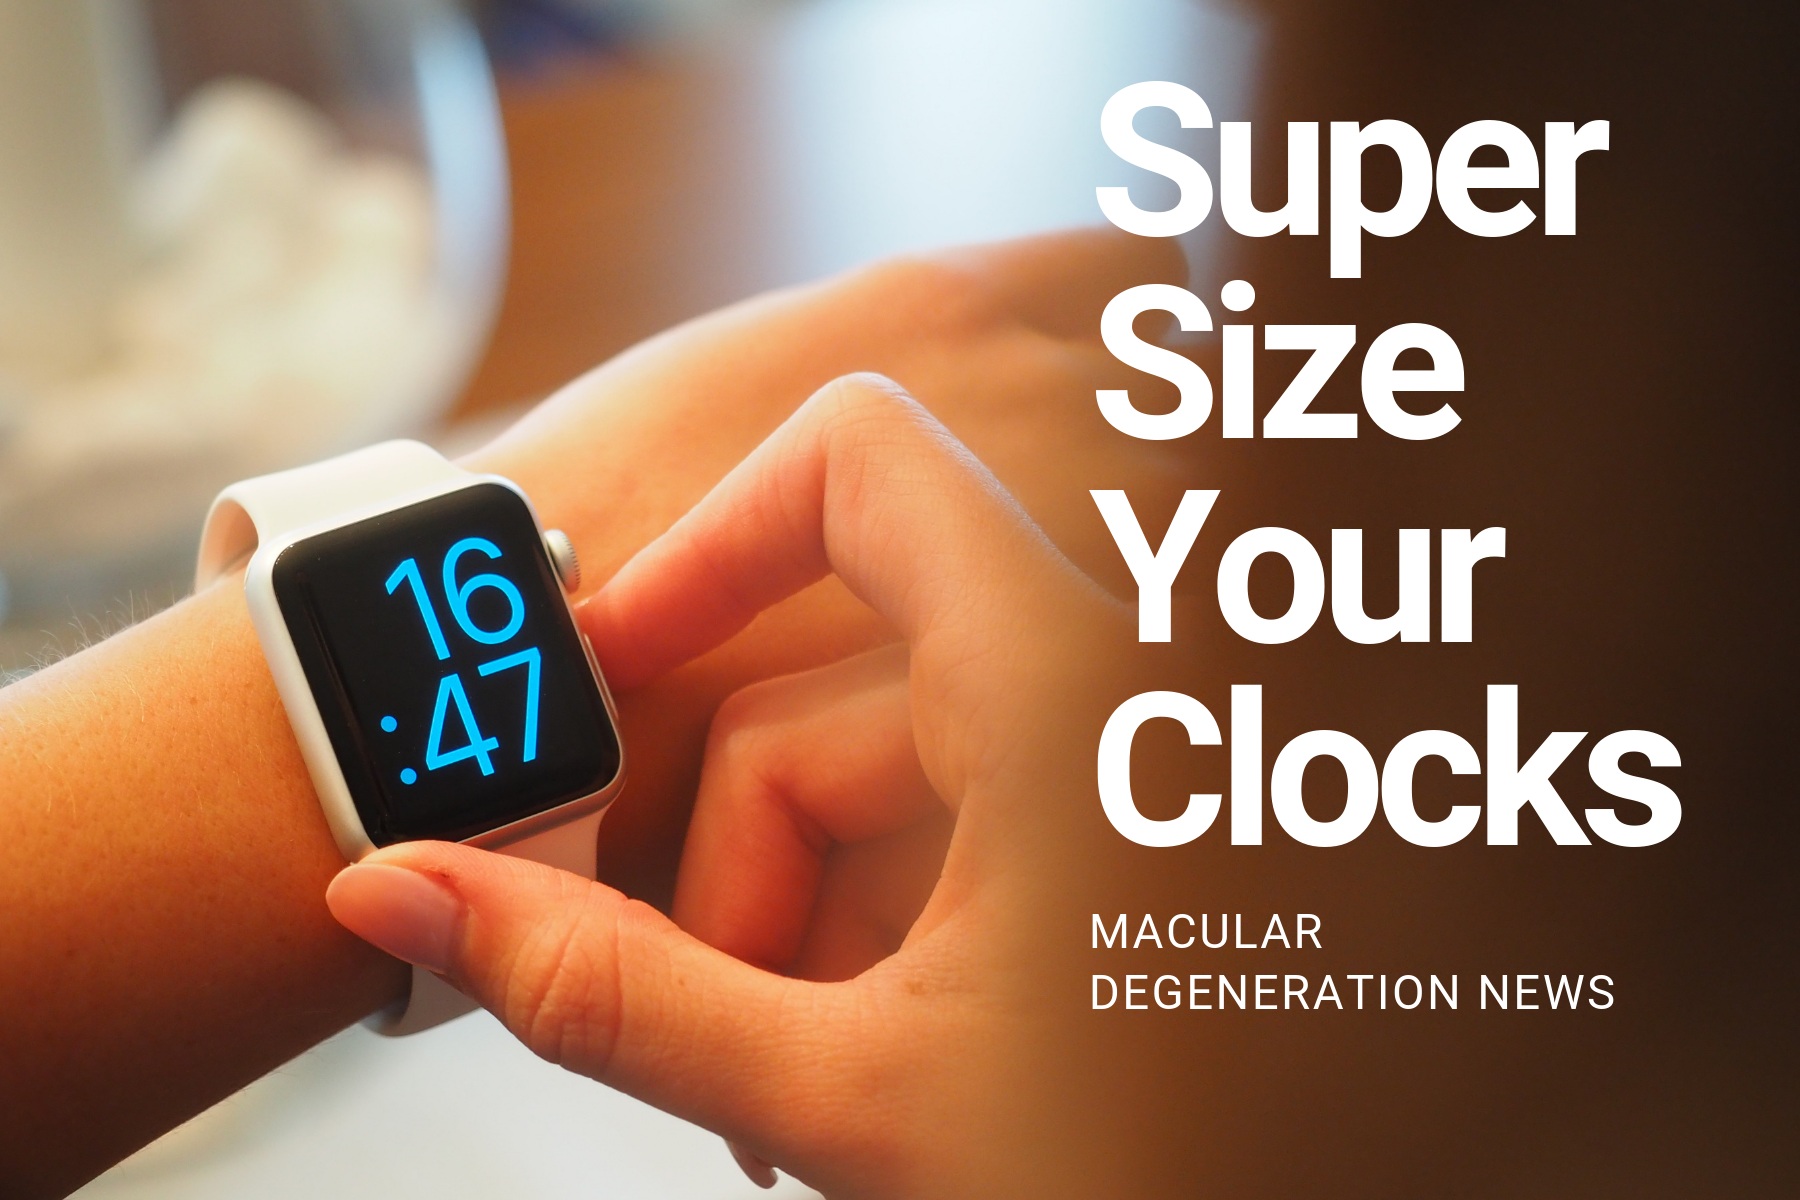 Macular Degeneration News: Super-Size Your Clocks